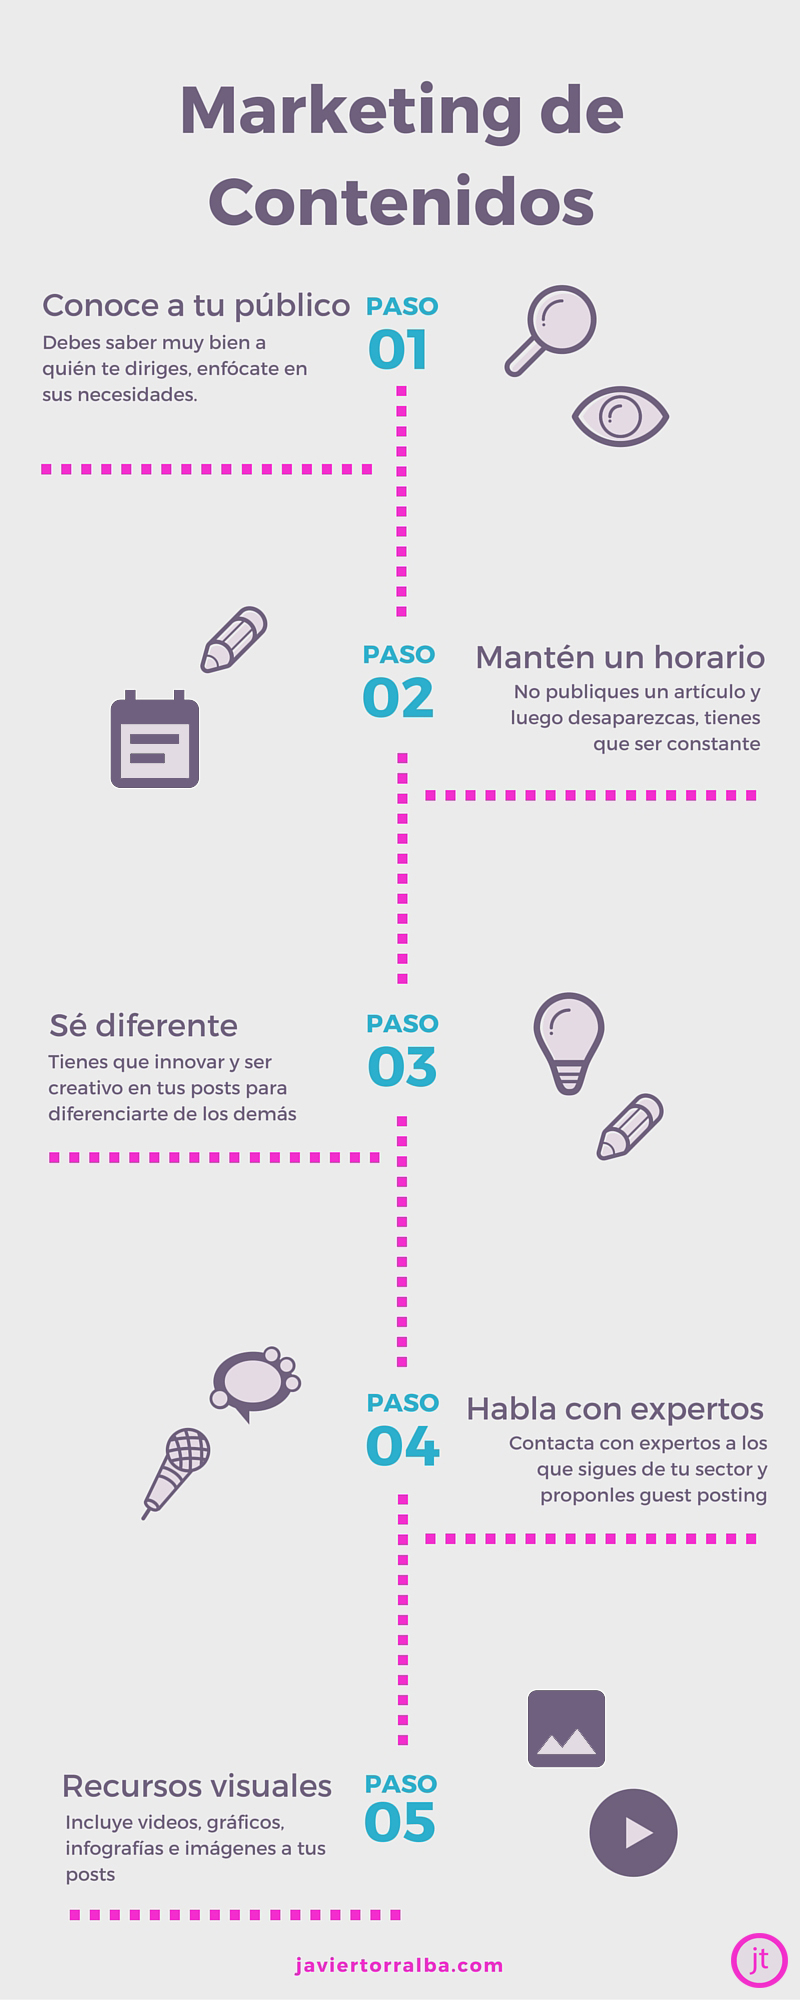 Marketing de contenidos en infografía